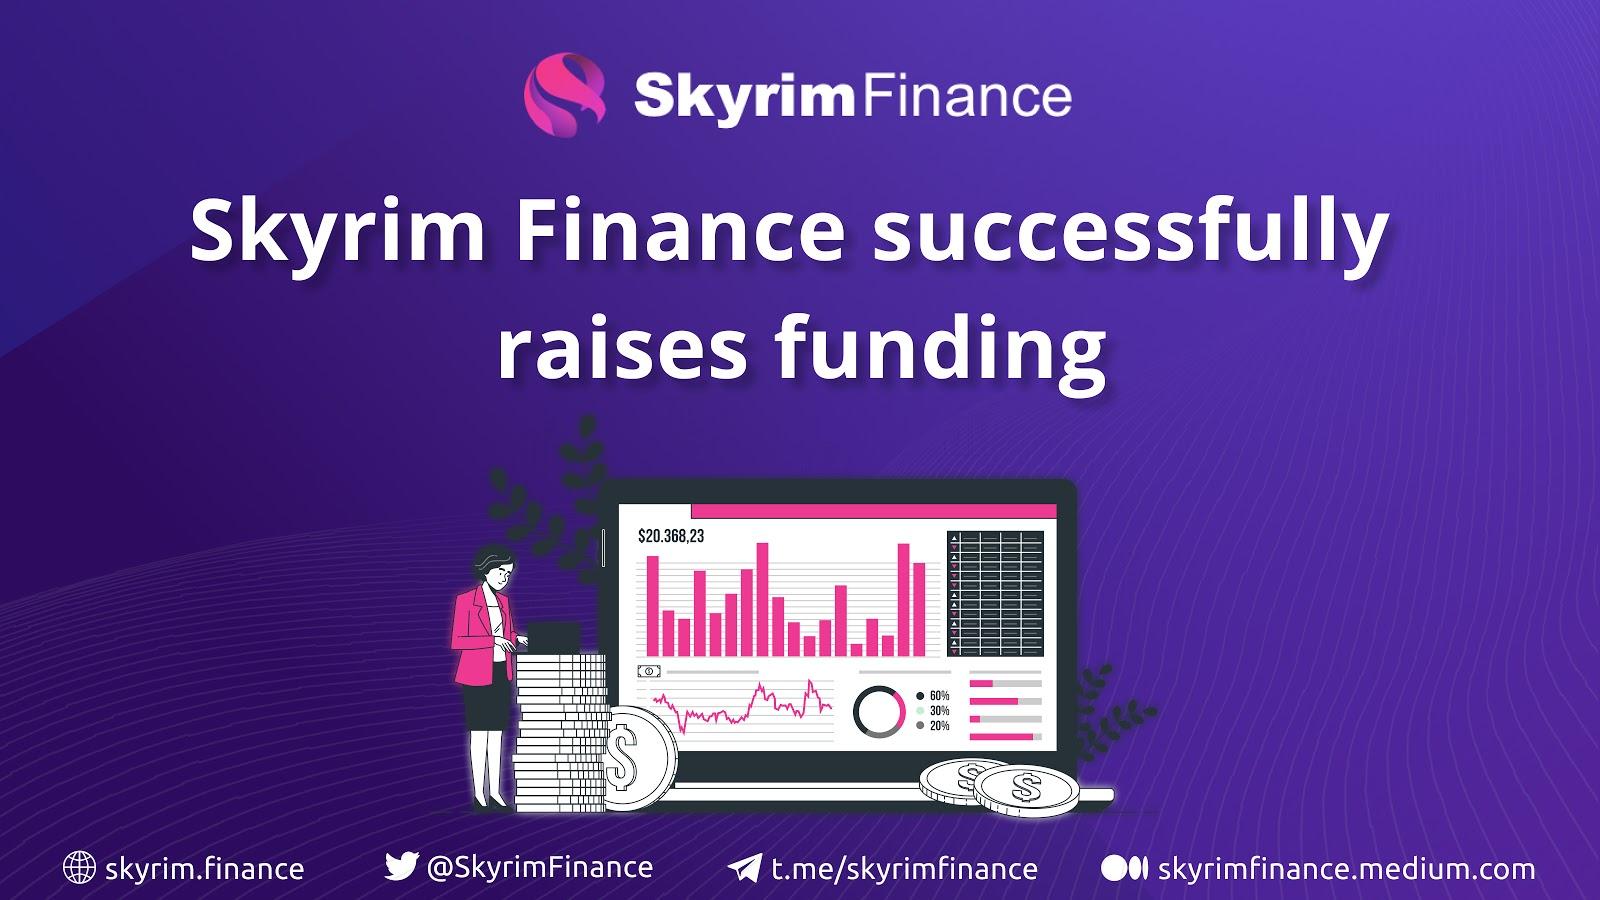 Skyrim Finance